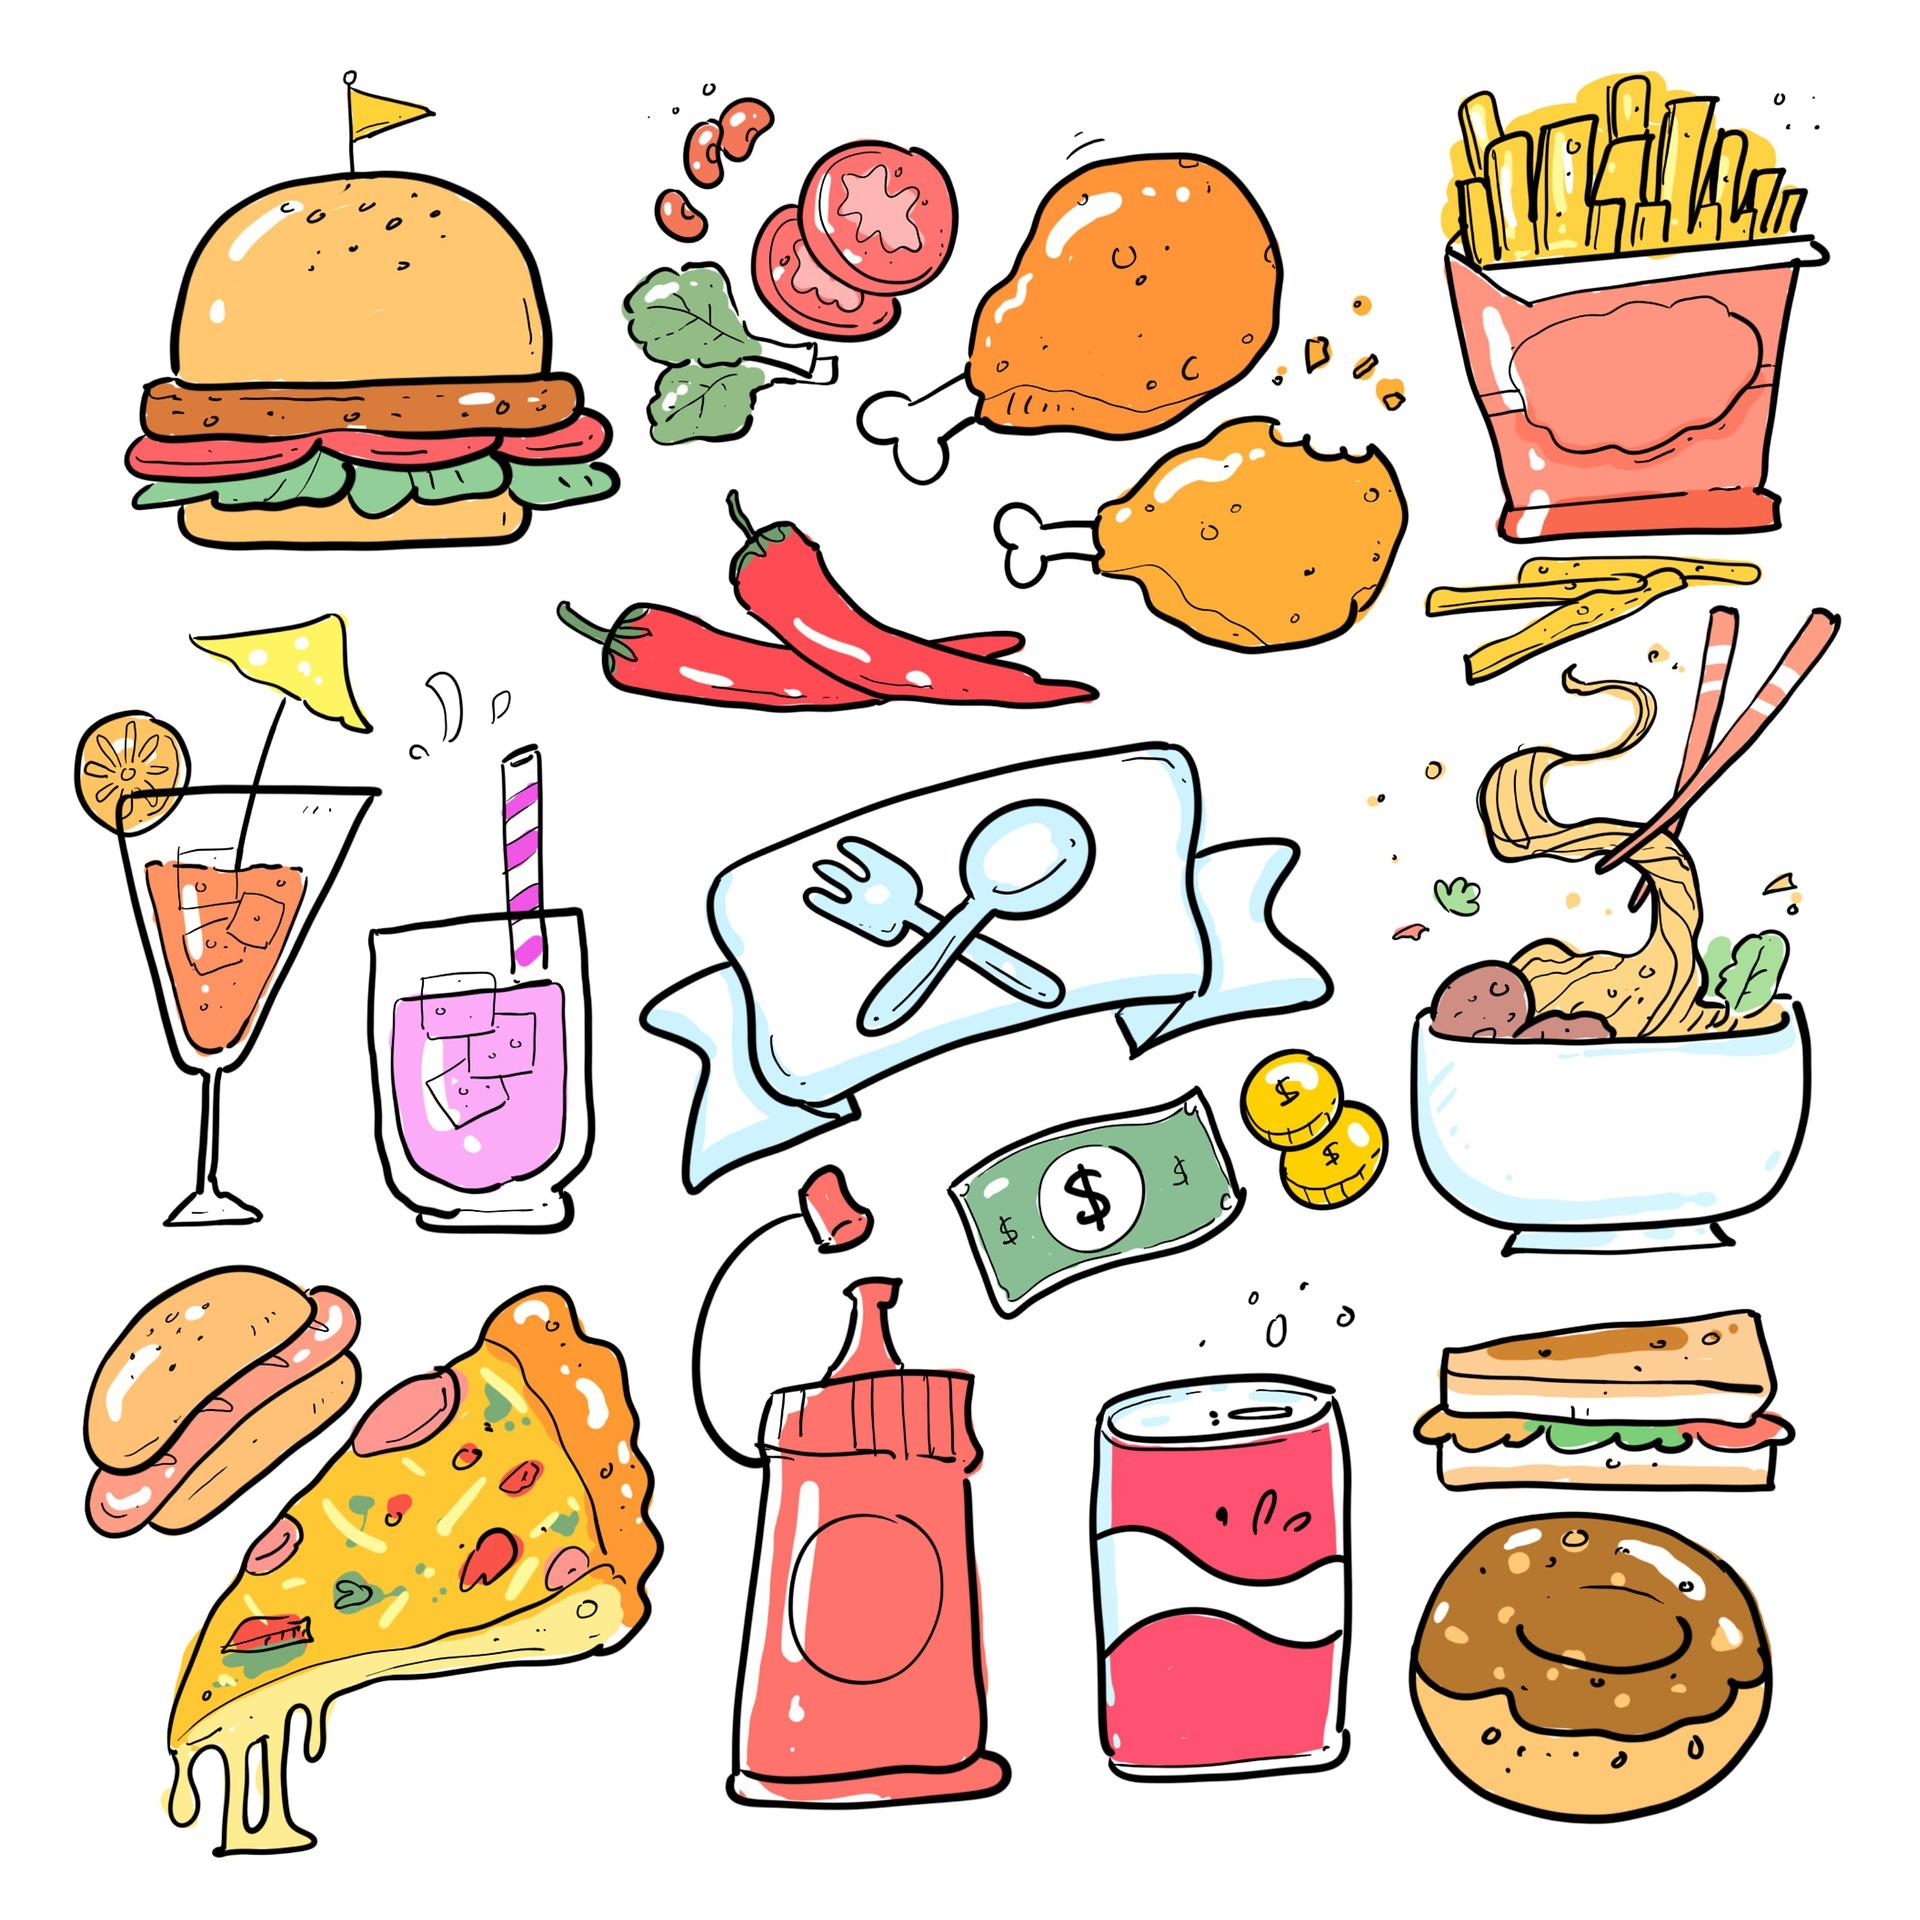 comida y líquidos que pueden causar reflujo silencioso (foods and liquids that can cause silent reflux / laryngopharyngeal reflux).